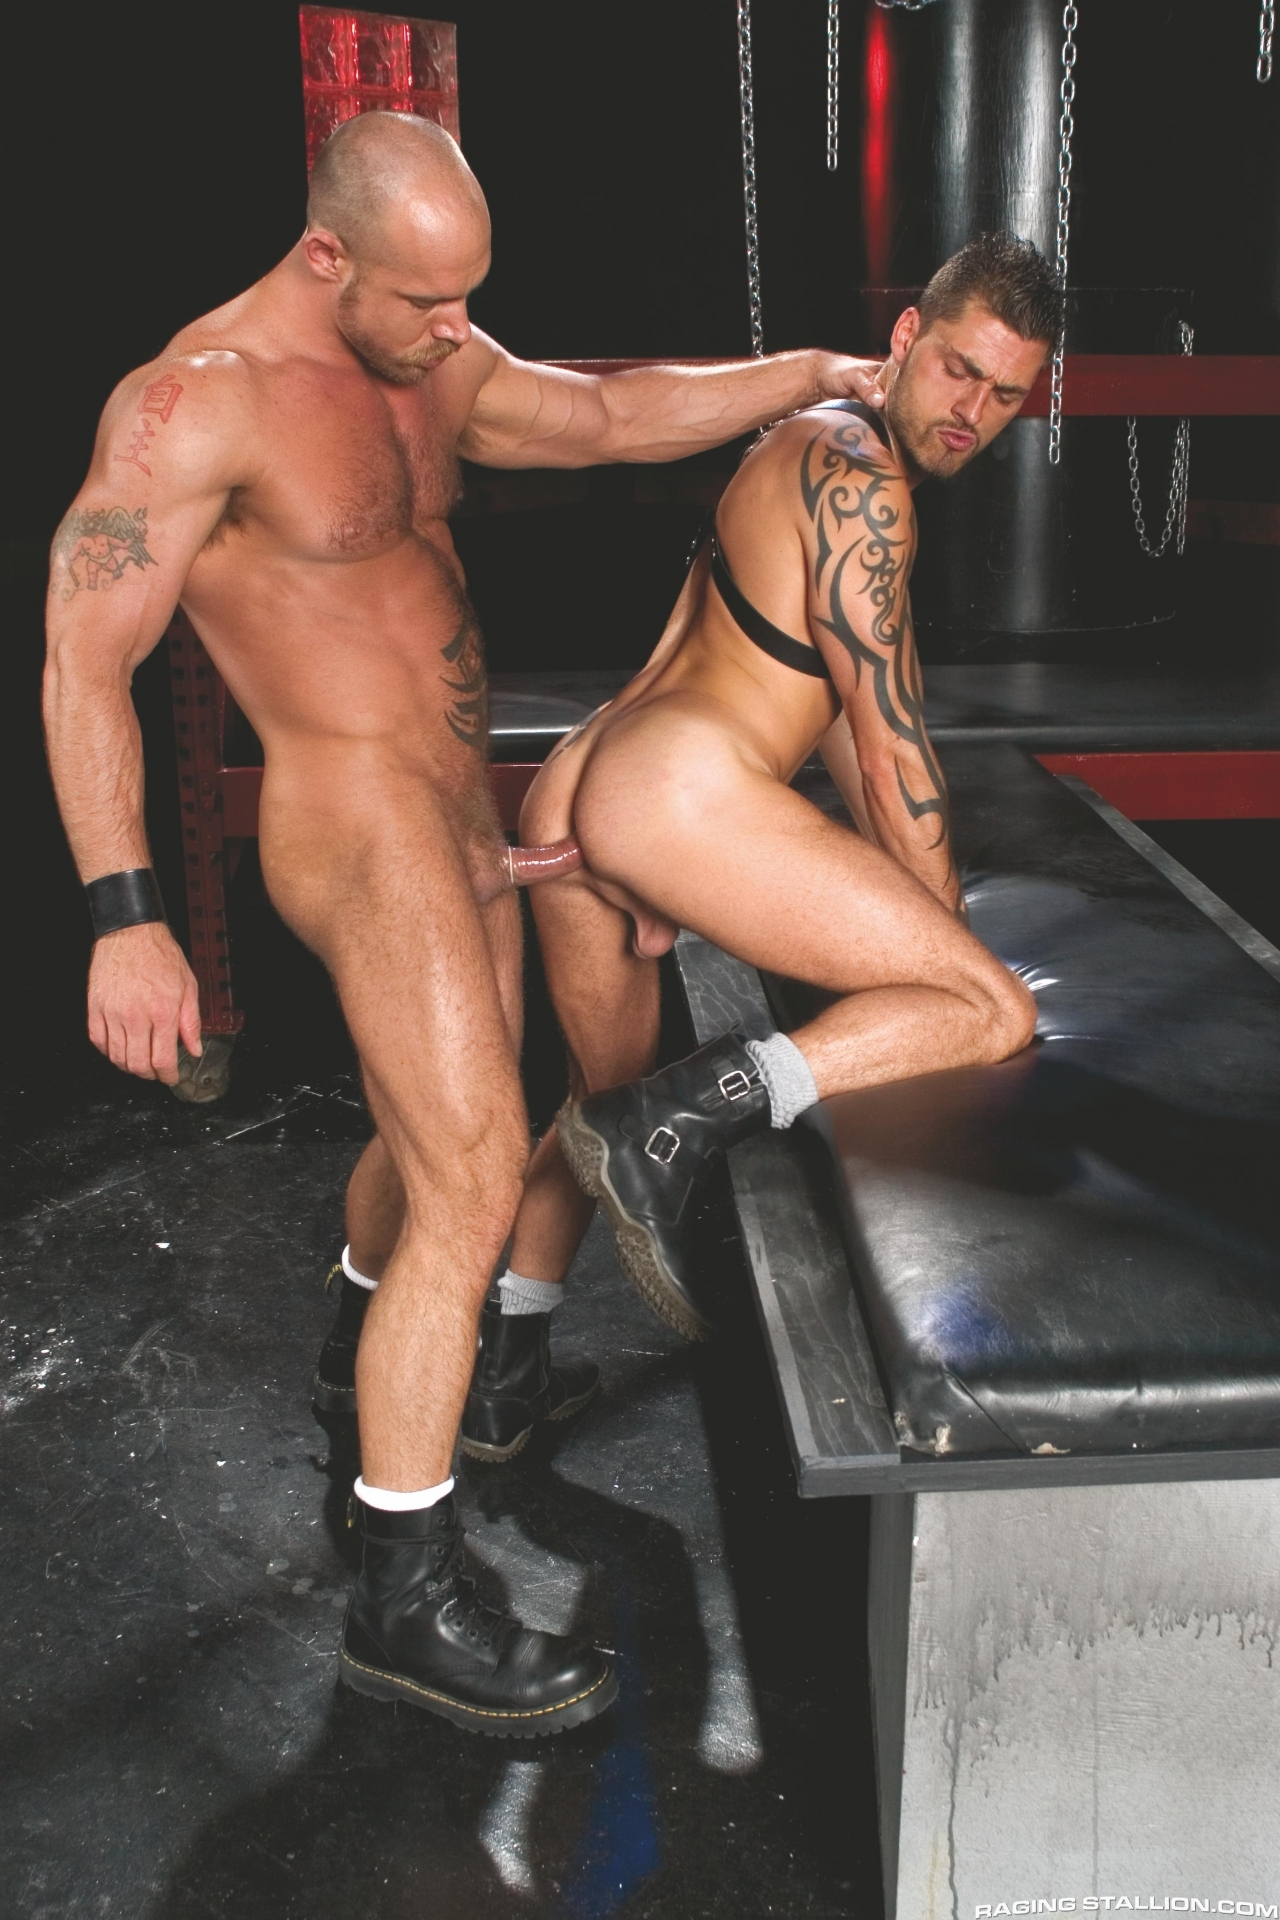 Jake Deckard fuck Tamas Eszterhazy gay hot daddy dude men porn Instinct